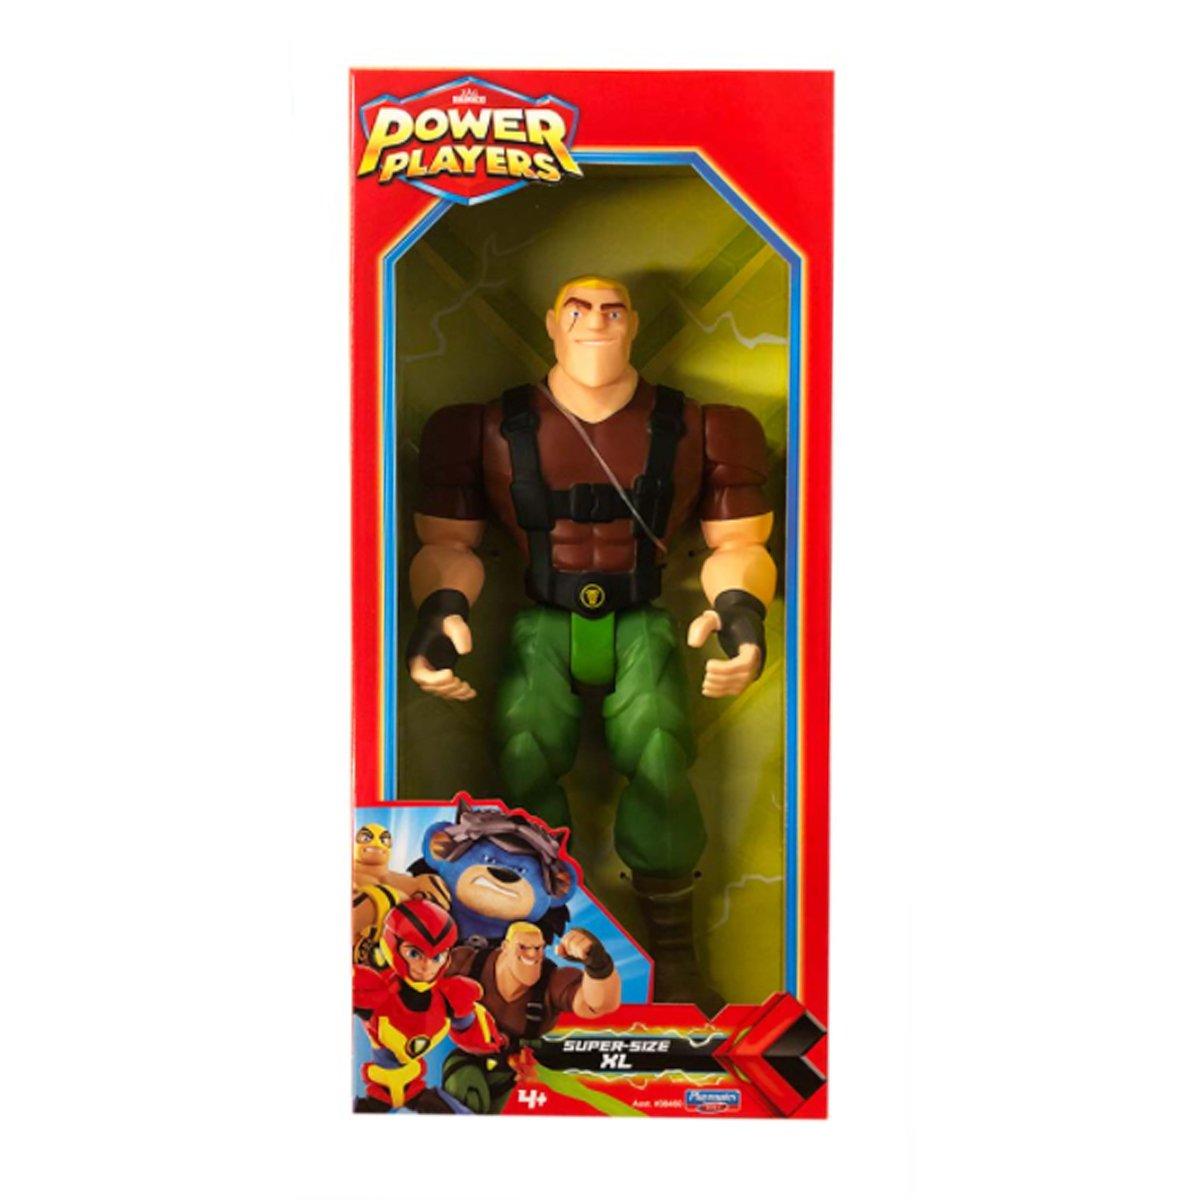 Figurina articulata Power Players, Sarge, XL